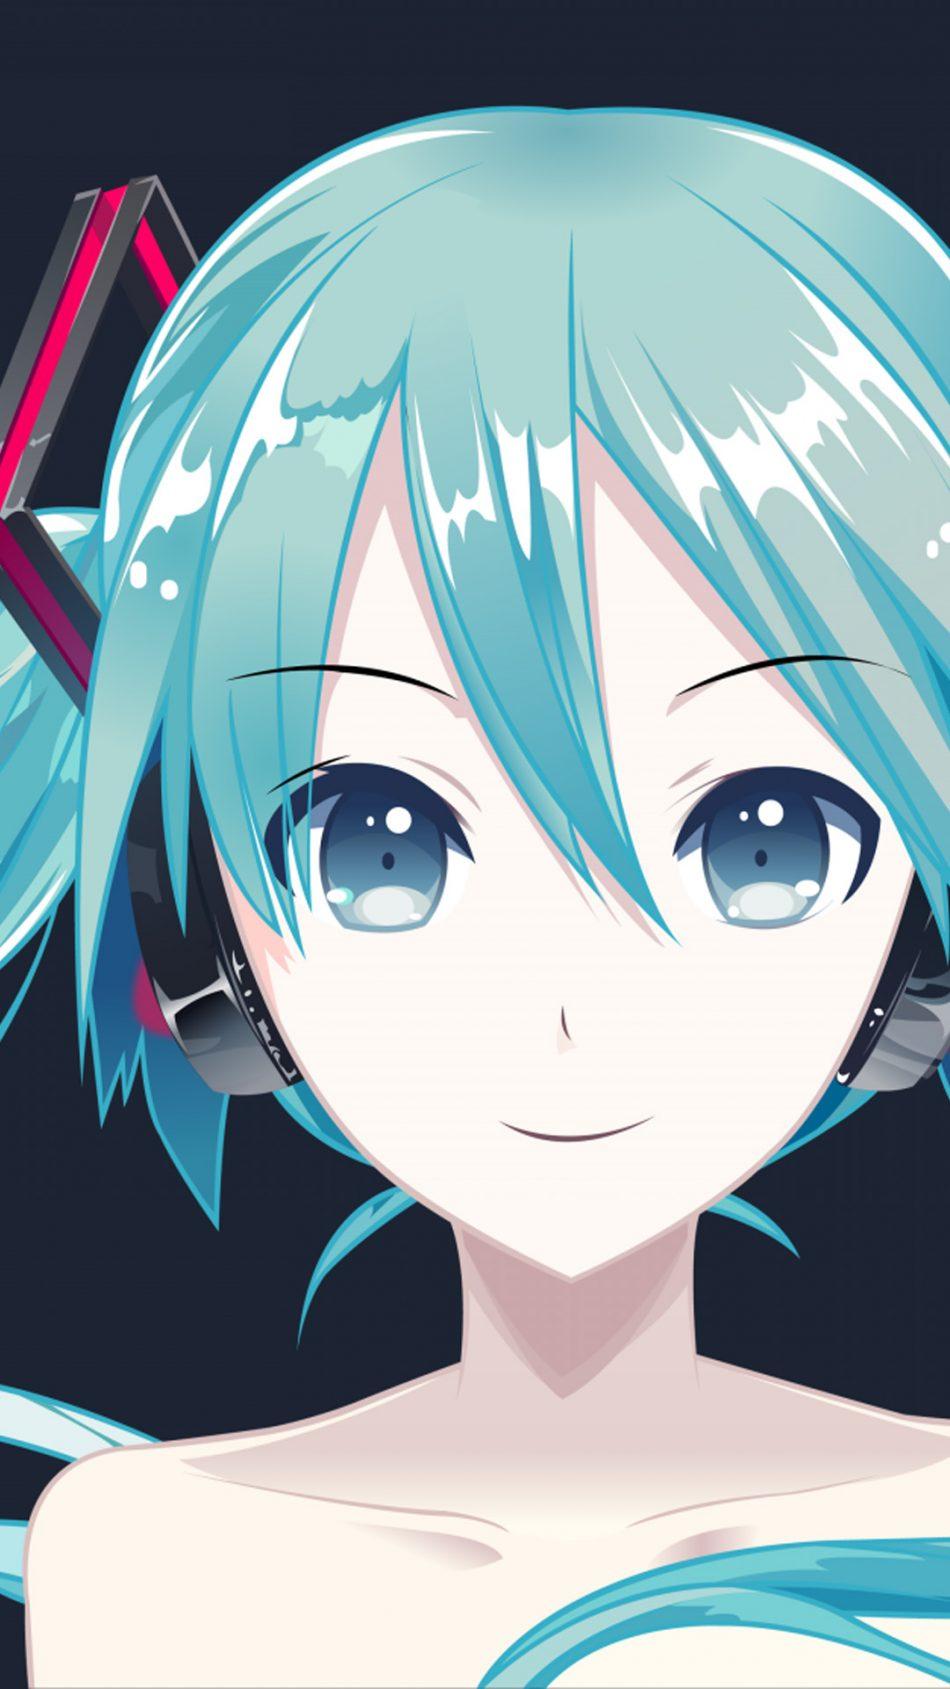 Hatsune Miku Anime Girl HD Mobile Wallpaper